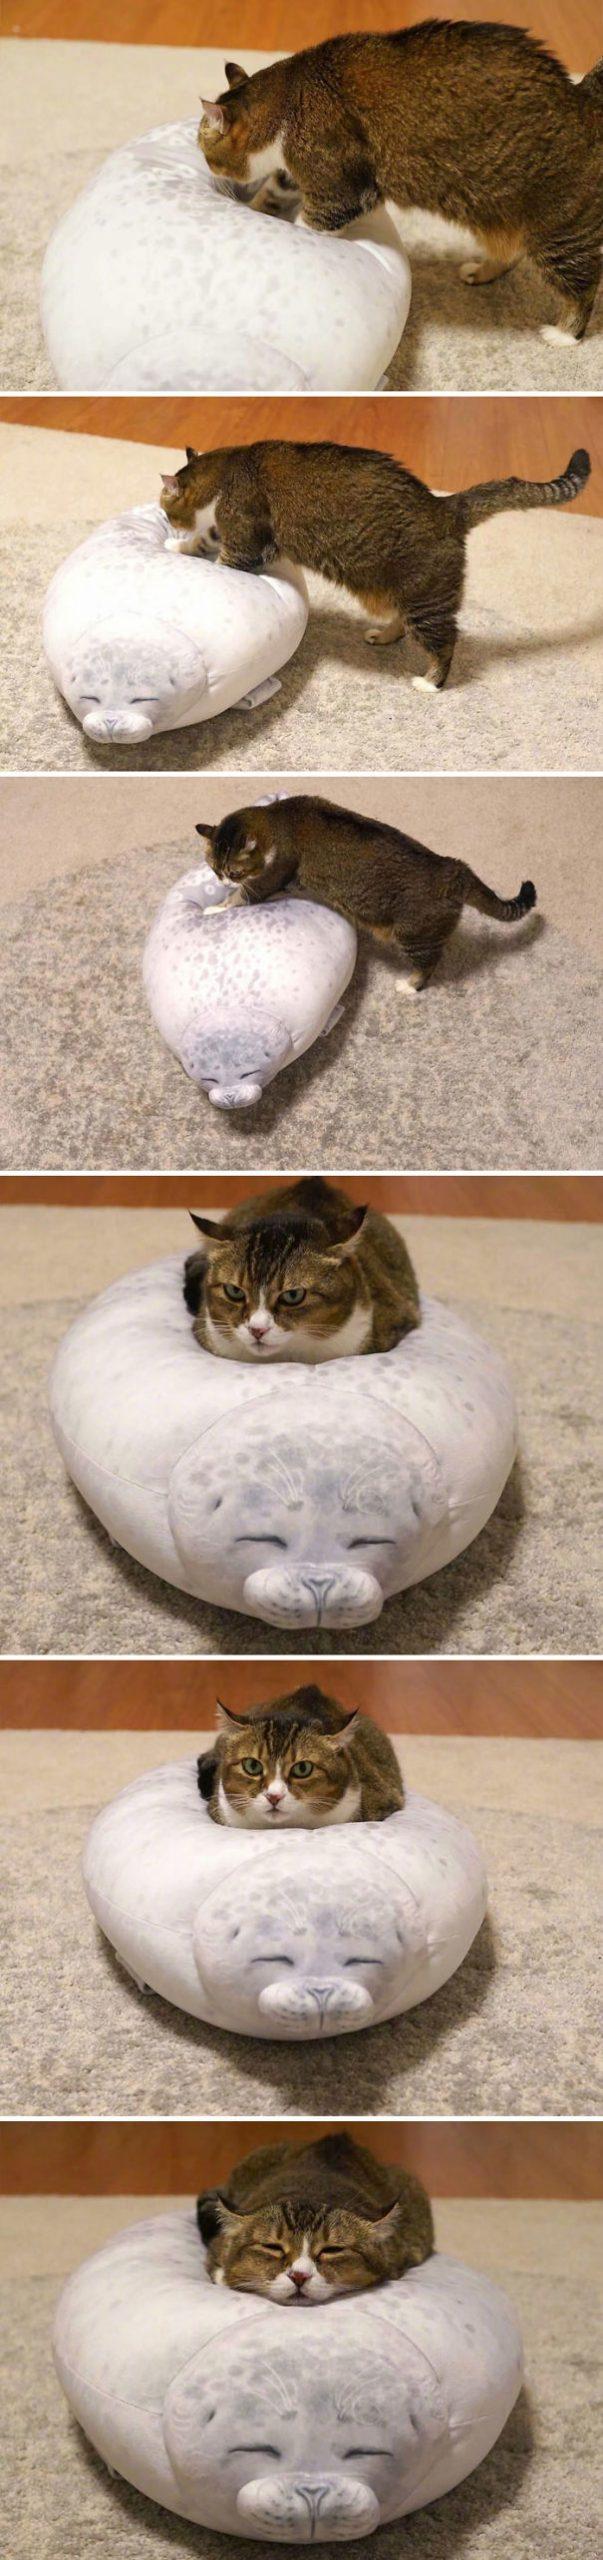 gato com almofada